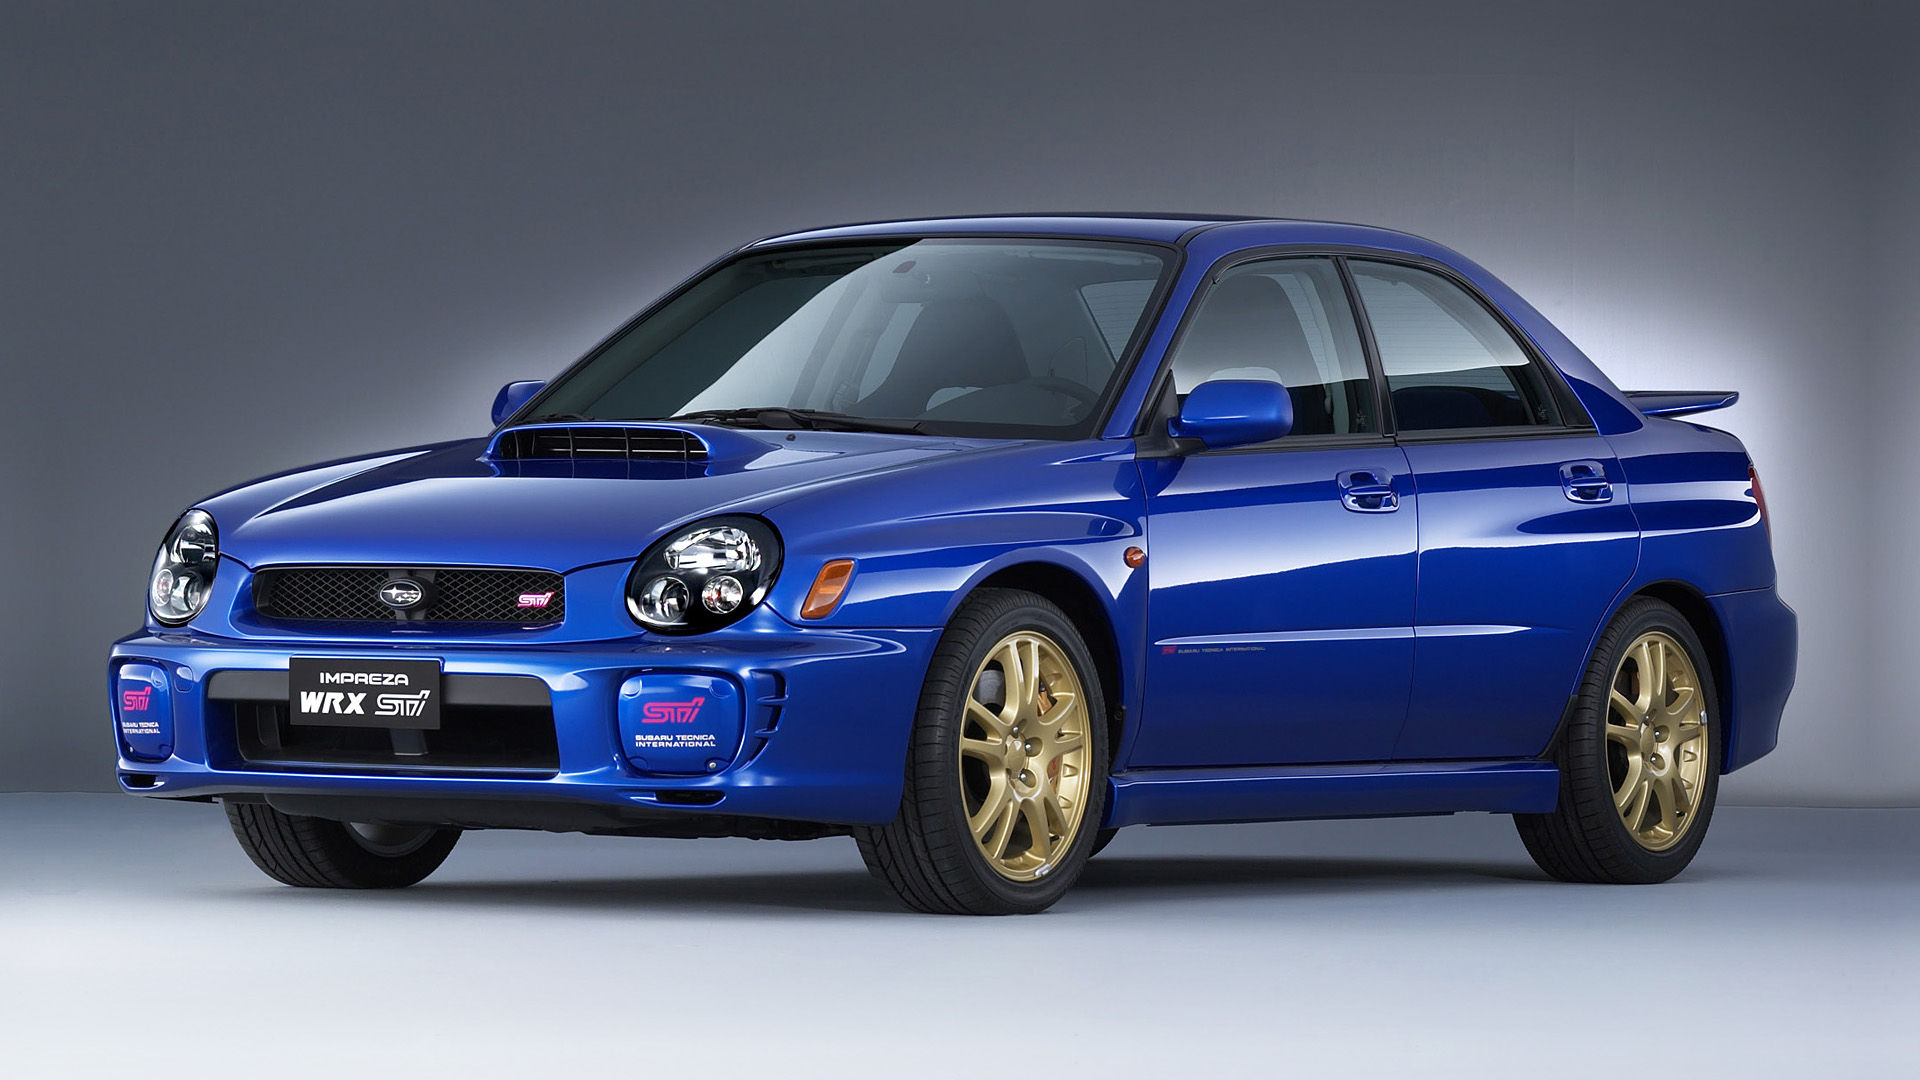 2002 Subaru Impreza WRX STI